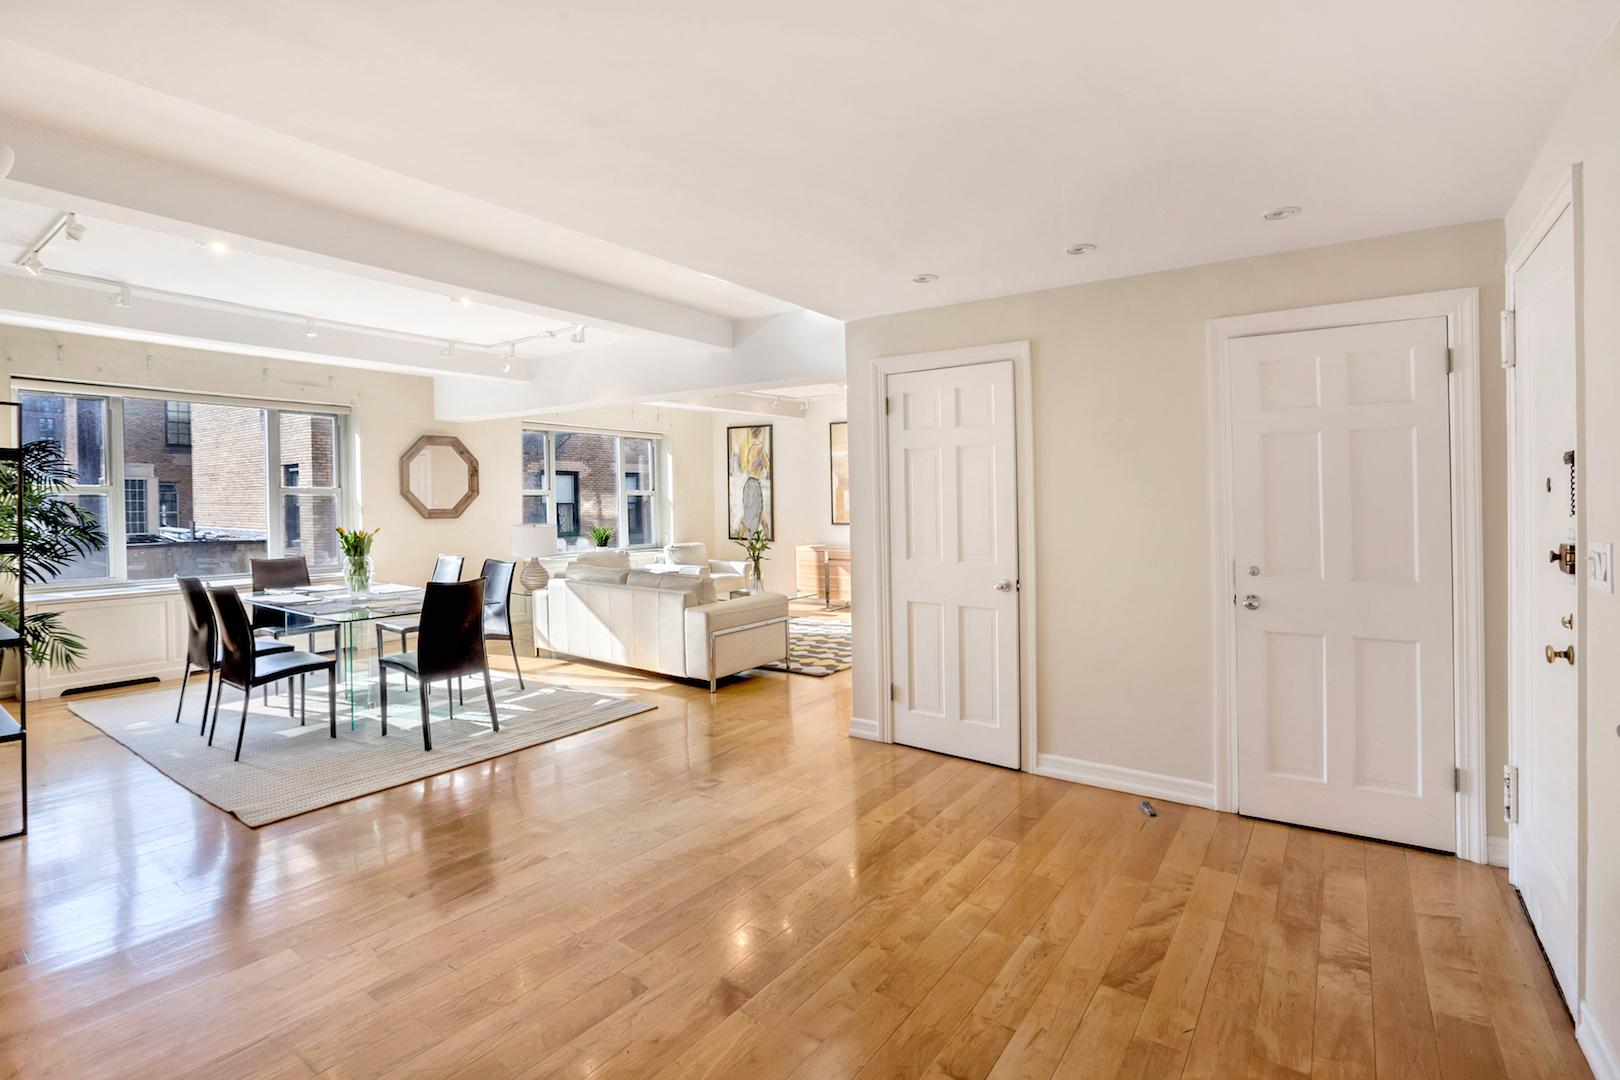 44 East 67th Street, Unit 8DE - $3,795,000